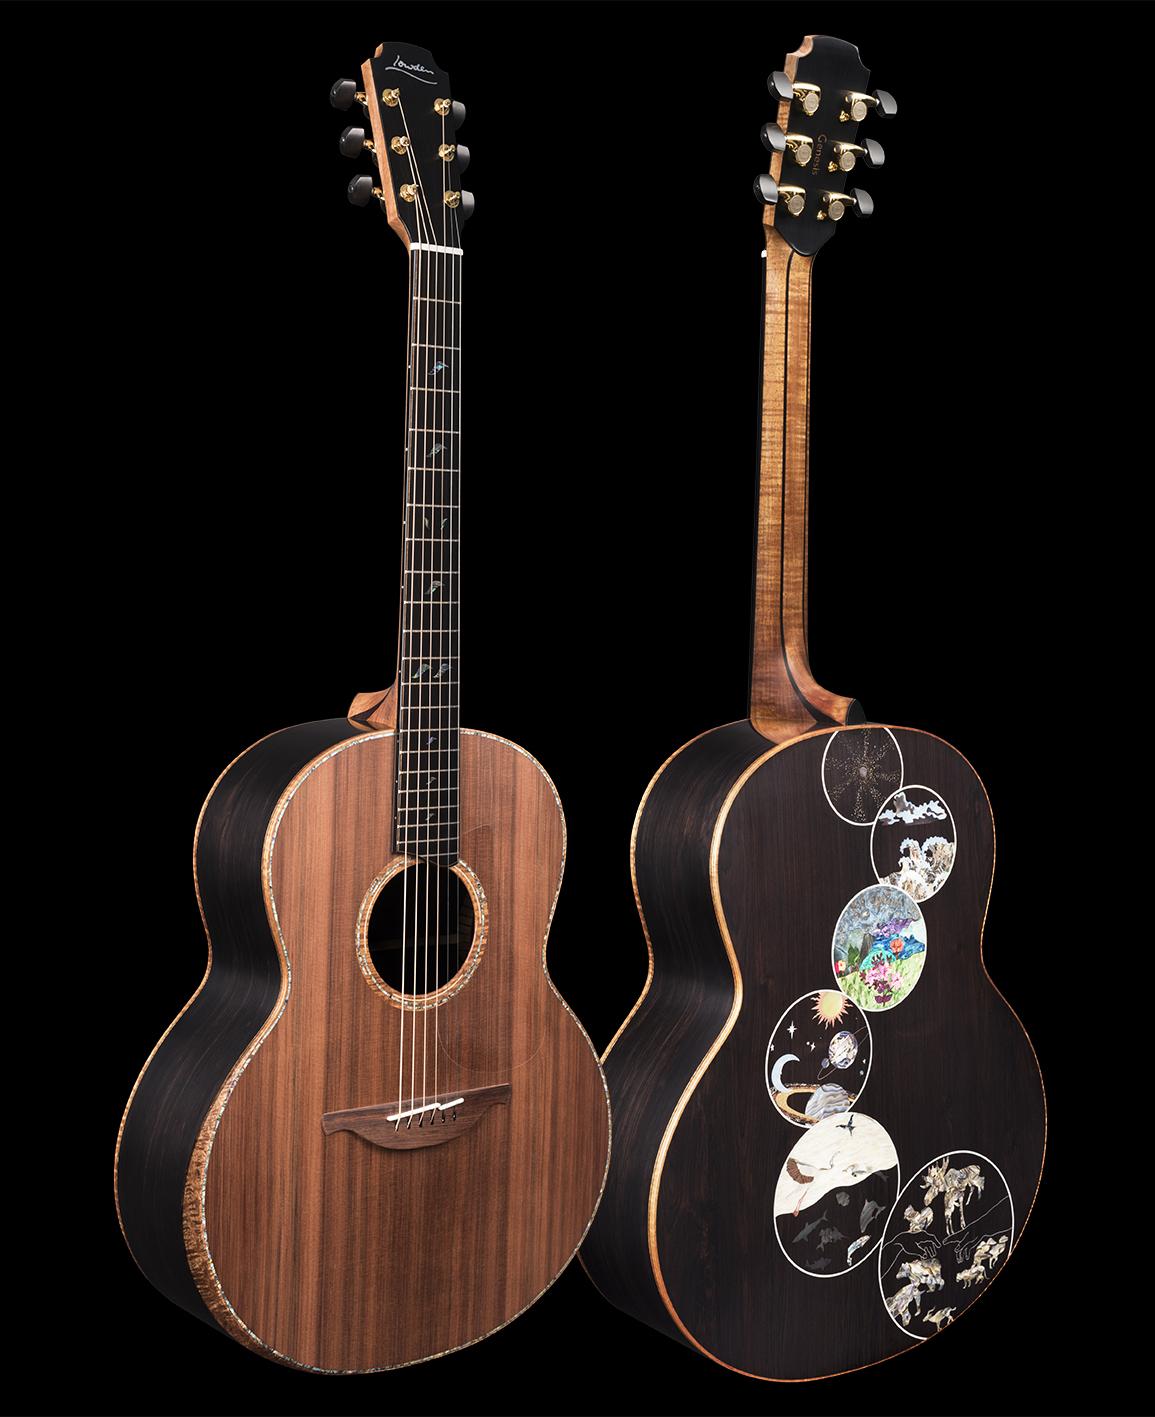 Lowden 'Genesis' guitar photographed by Vizz Creative